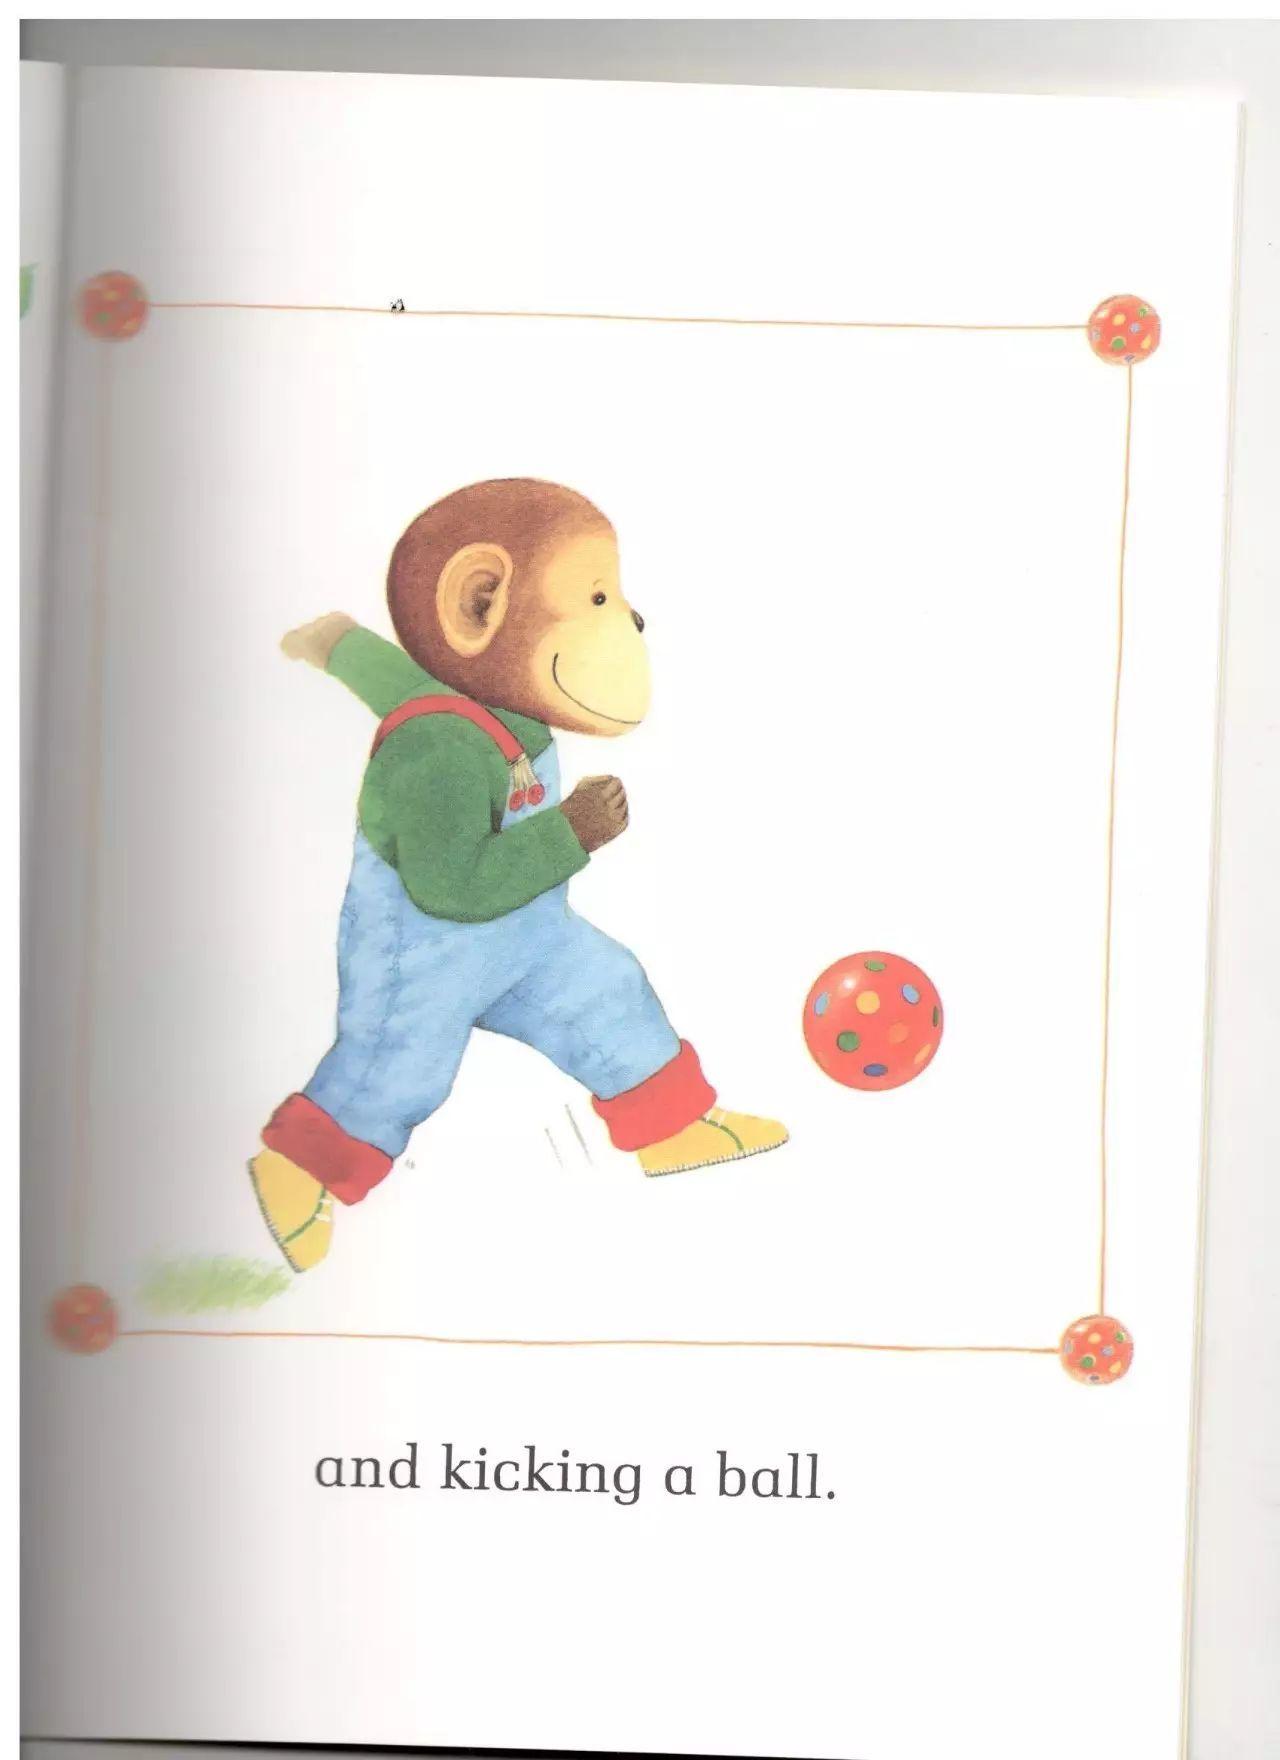 Things I Like 我喜欢的一切 -第8张图片-58绘本网-专注儿童绘本批发销售。